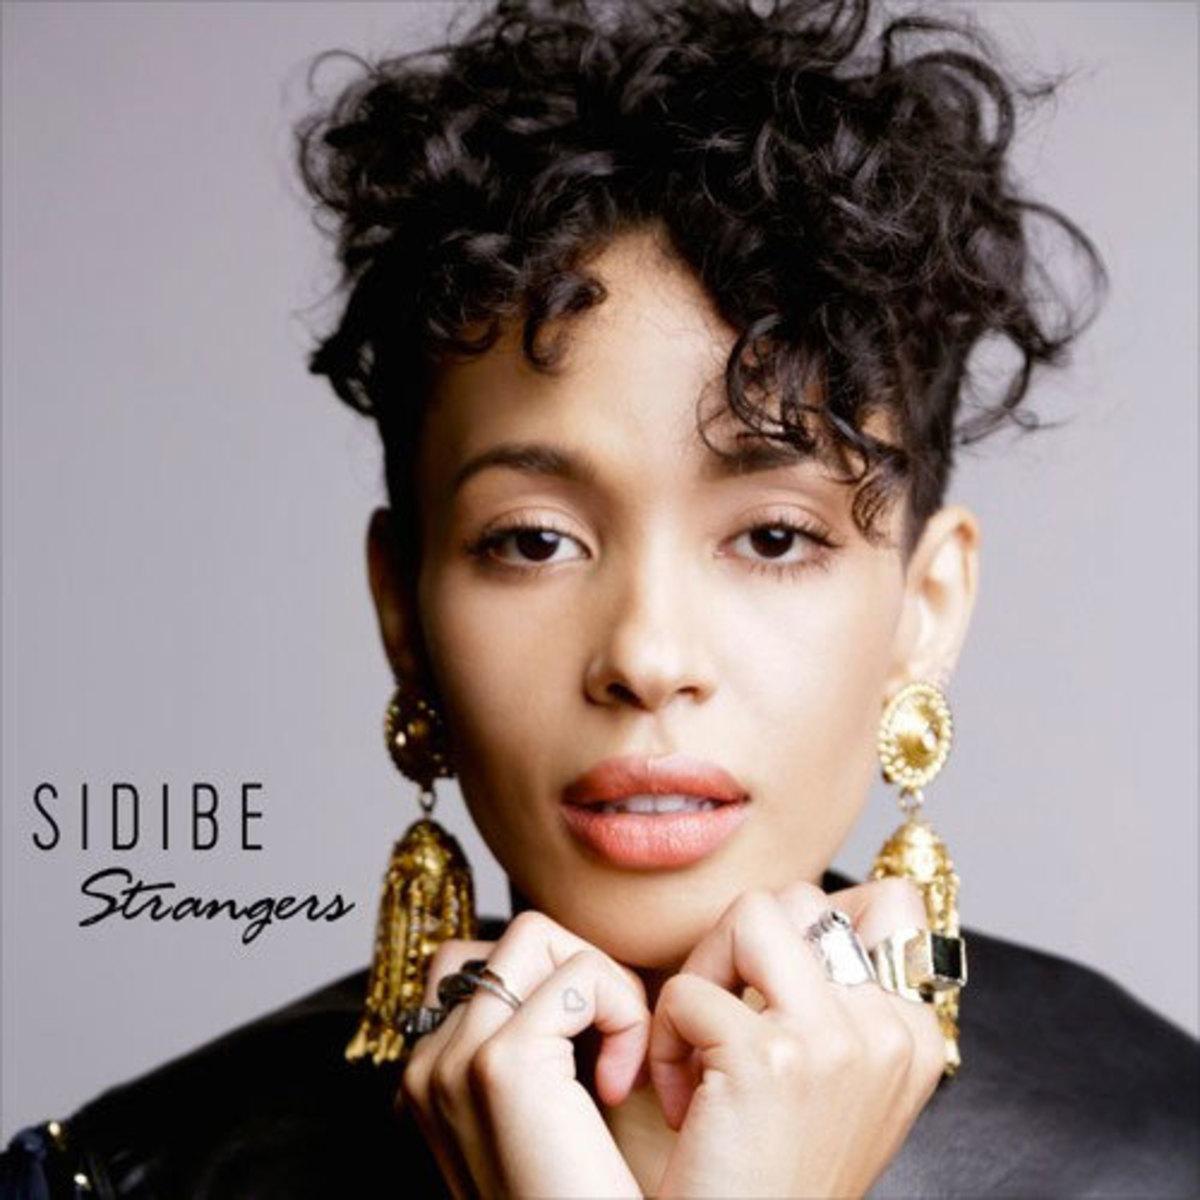 sidibe-strangers.jpg